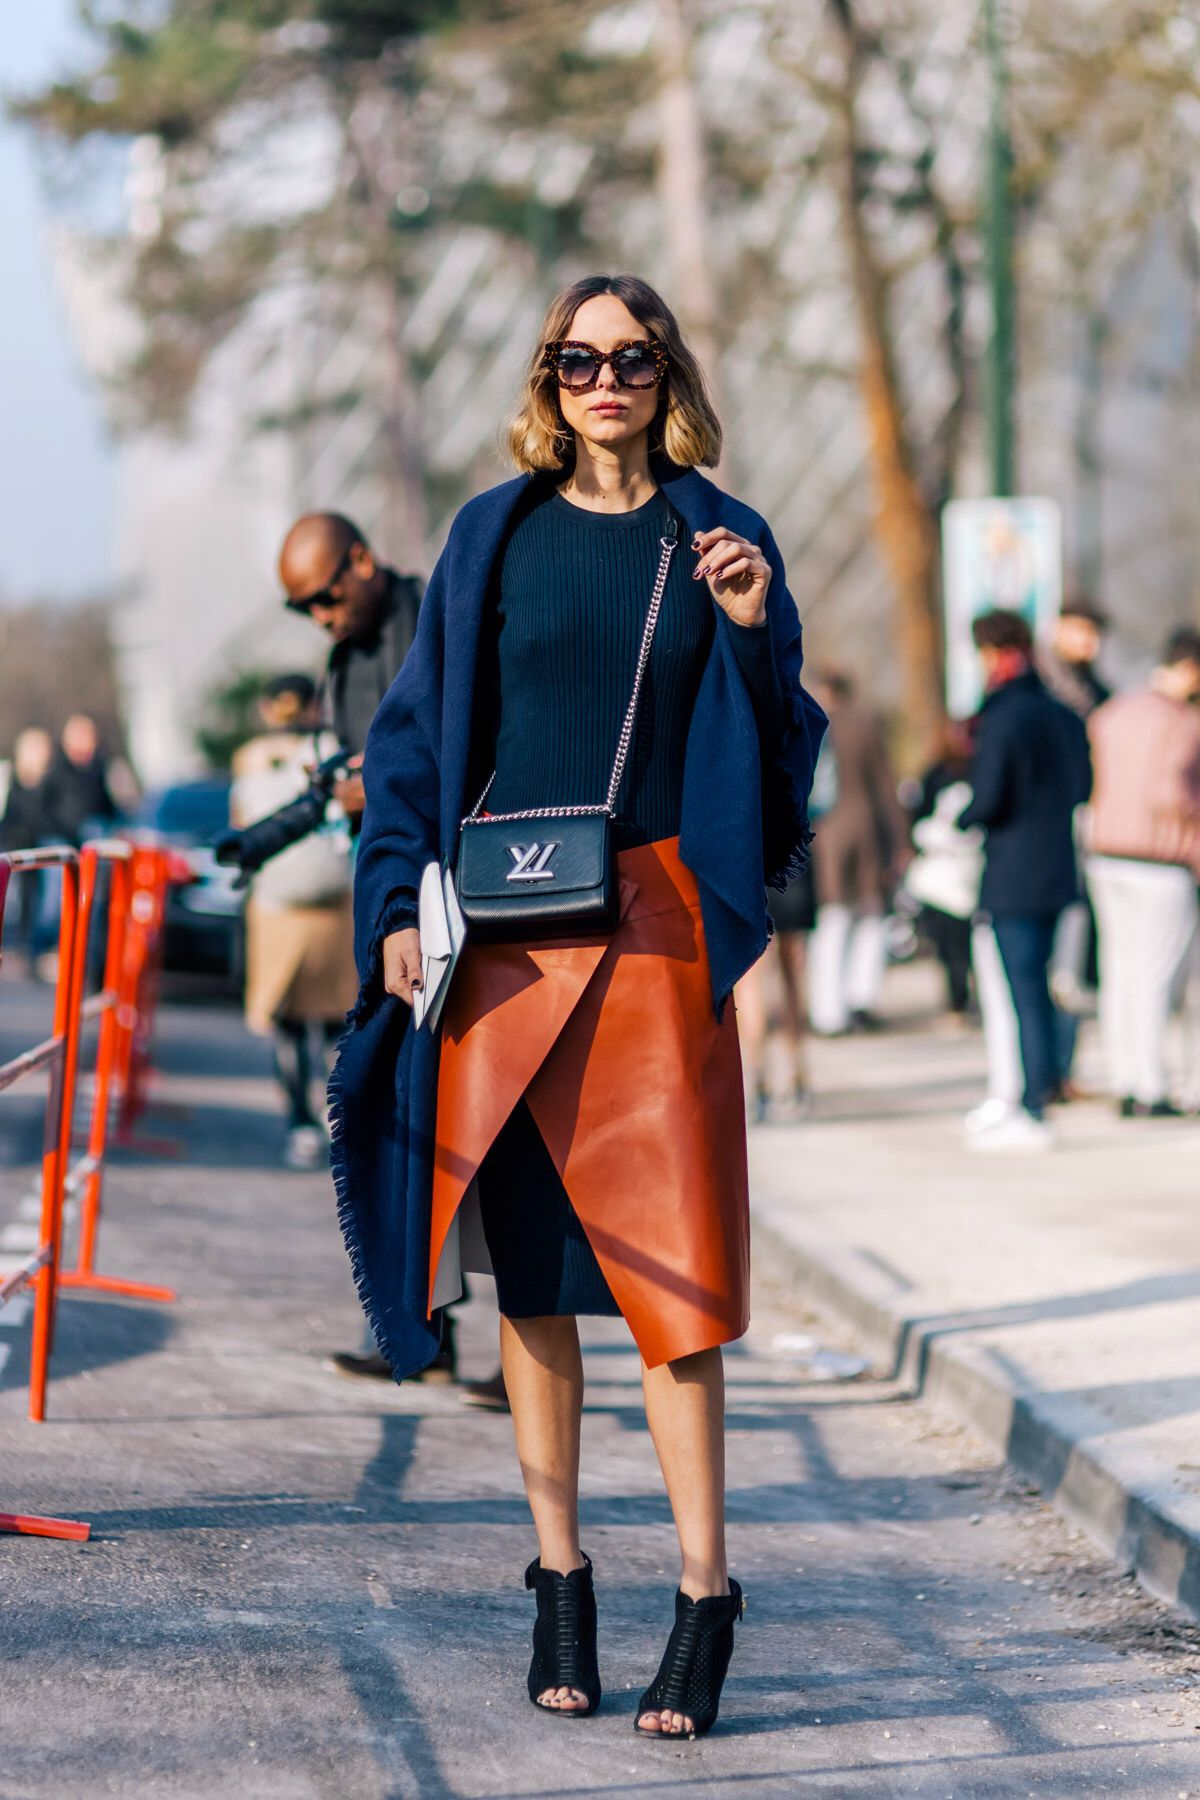 StreetStyle Fashion week  Spring/summer 2016